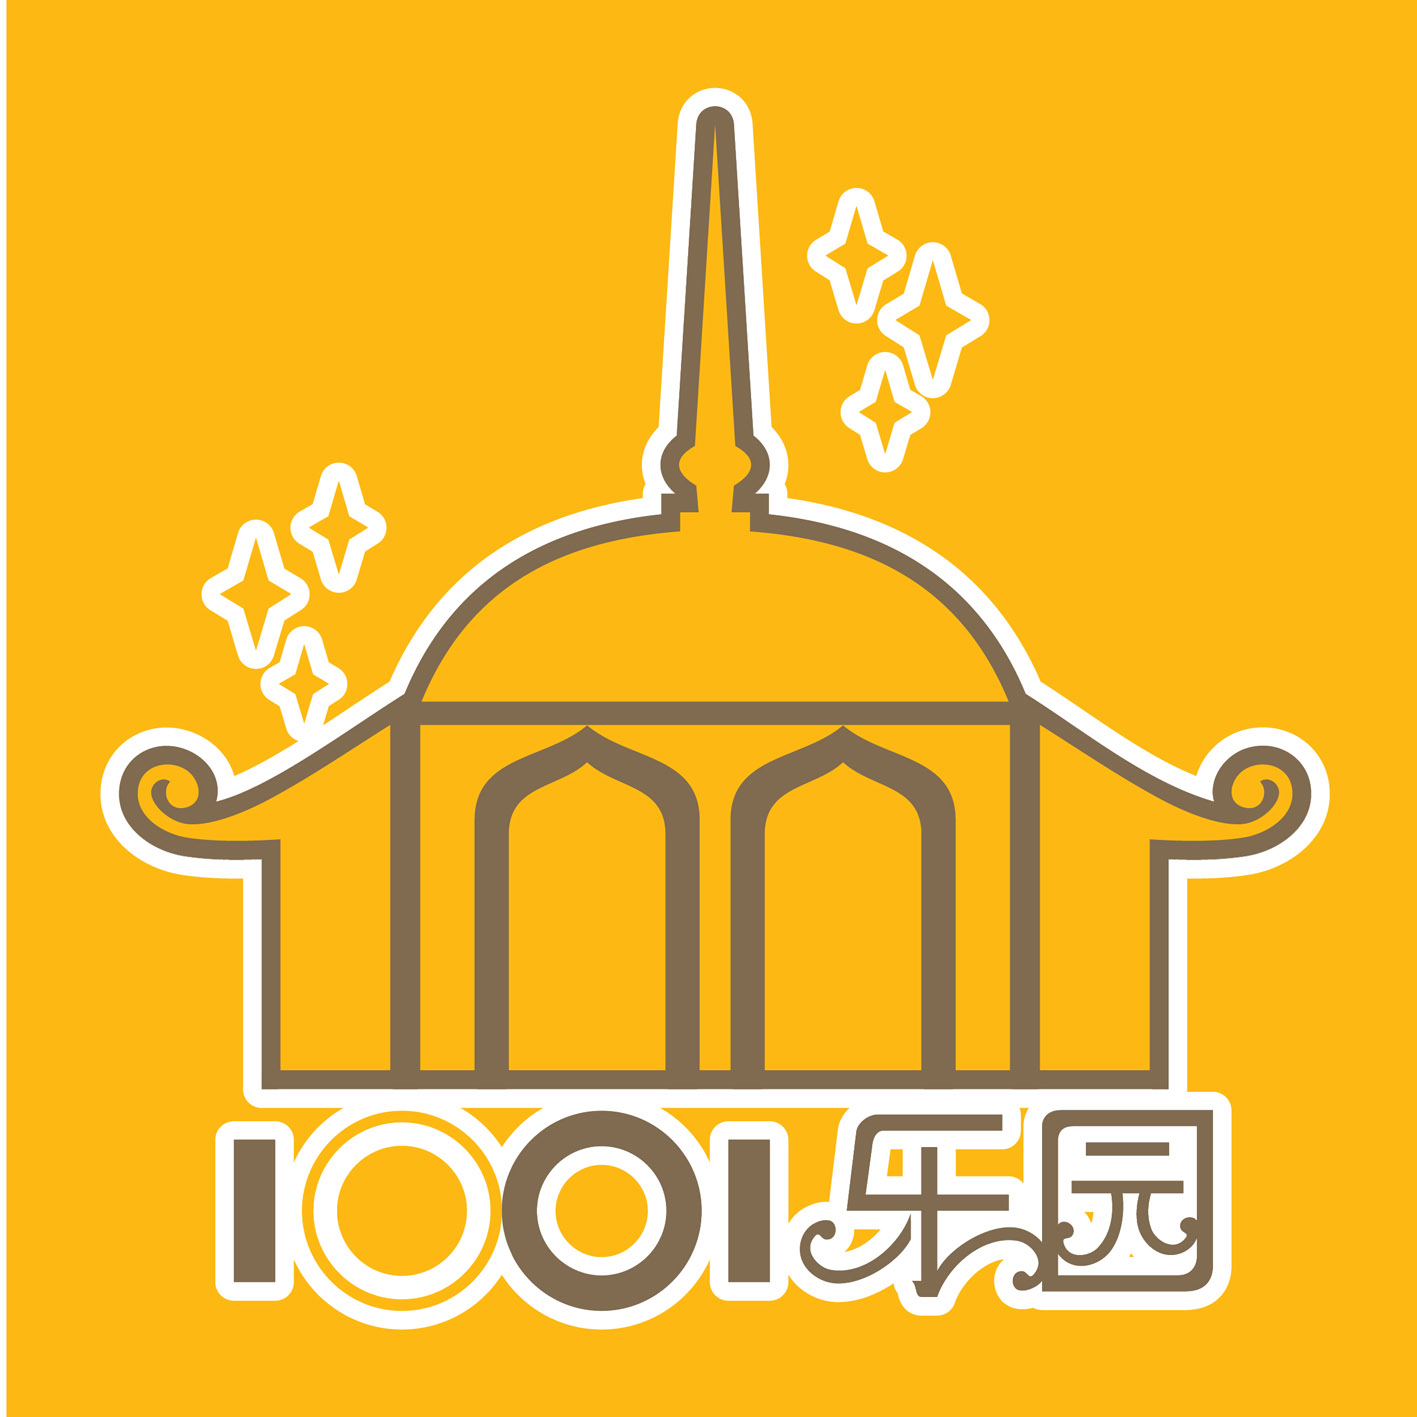 1001乐园